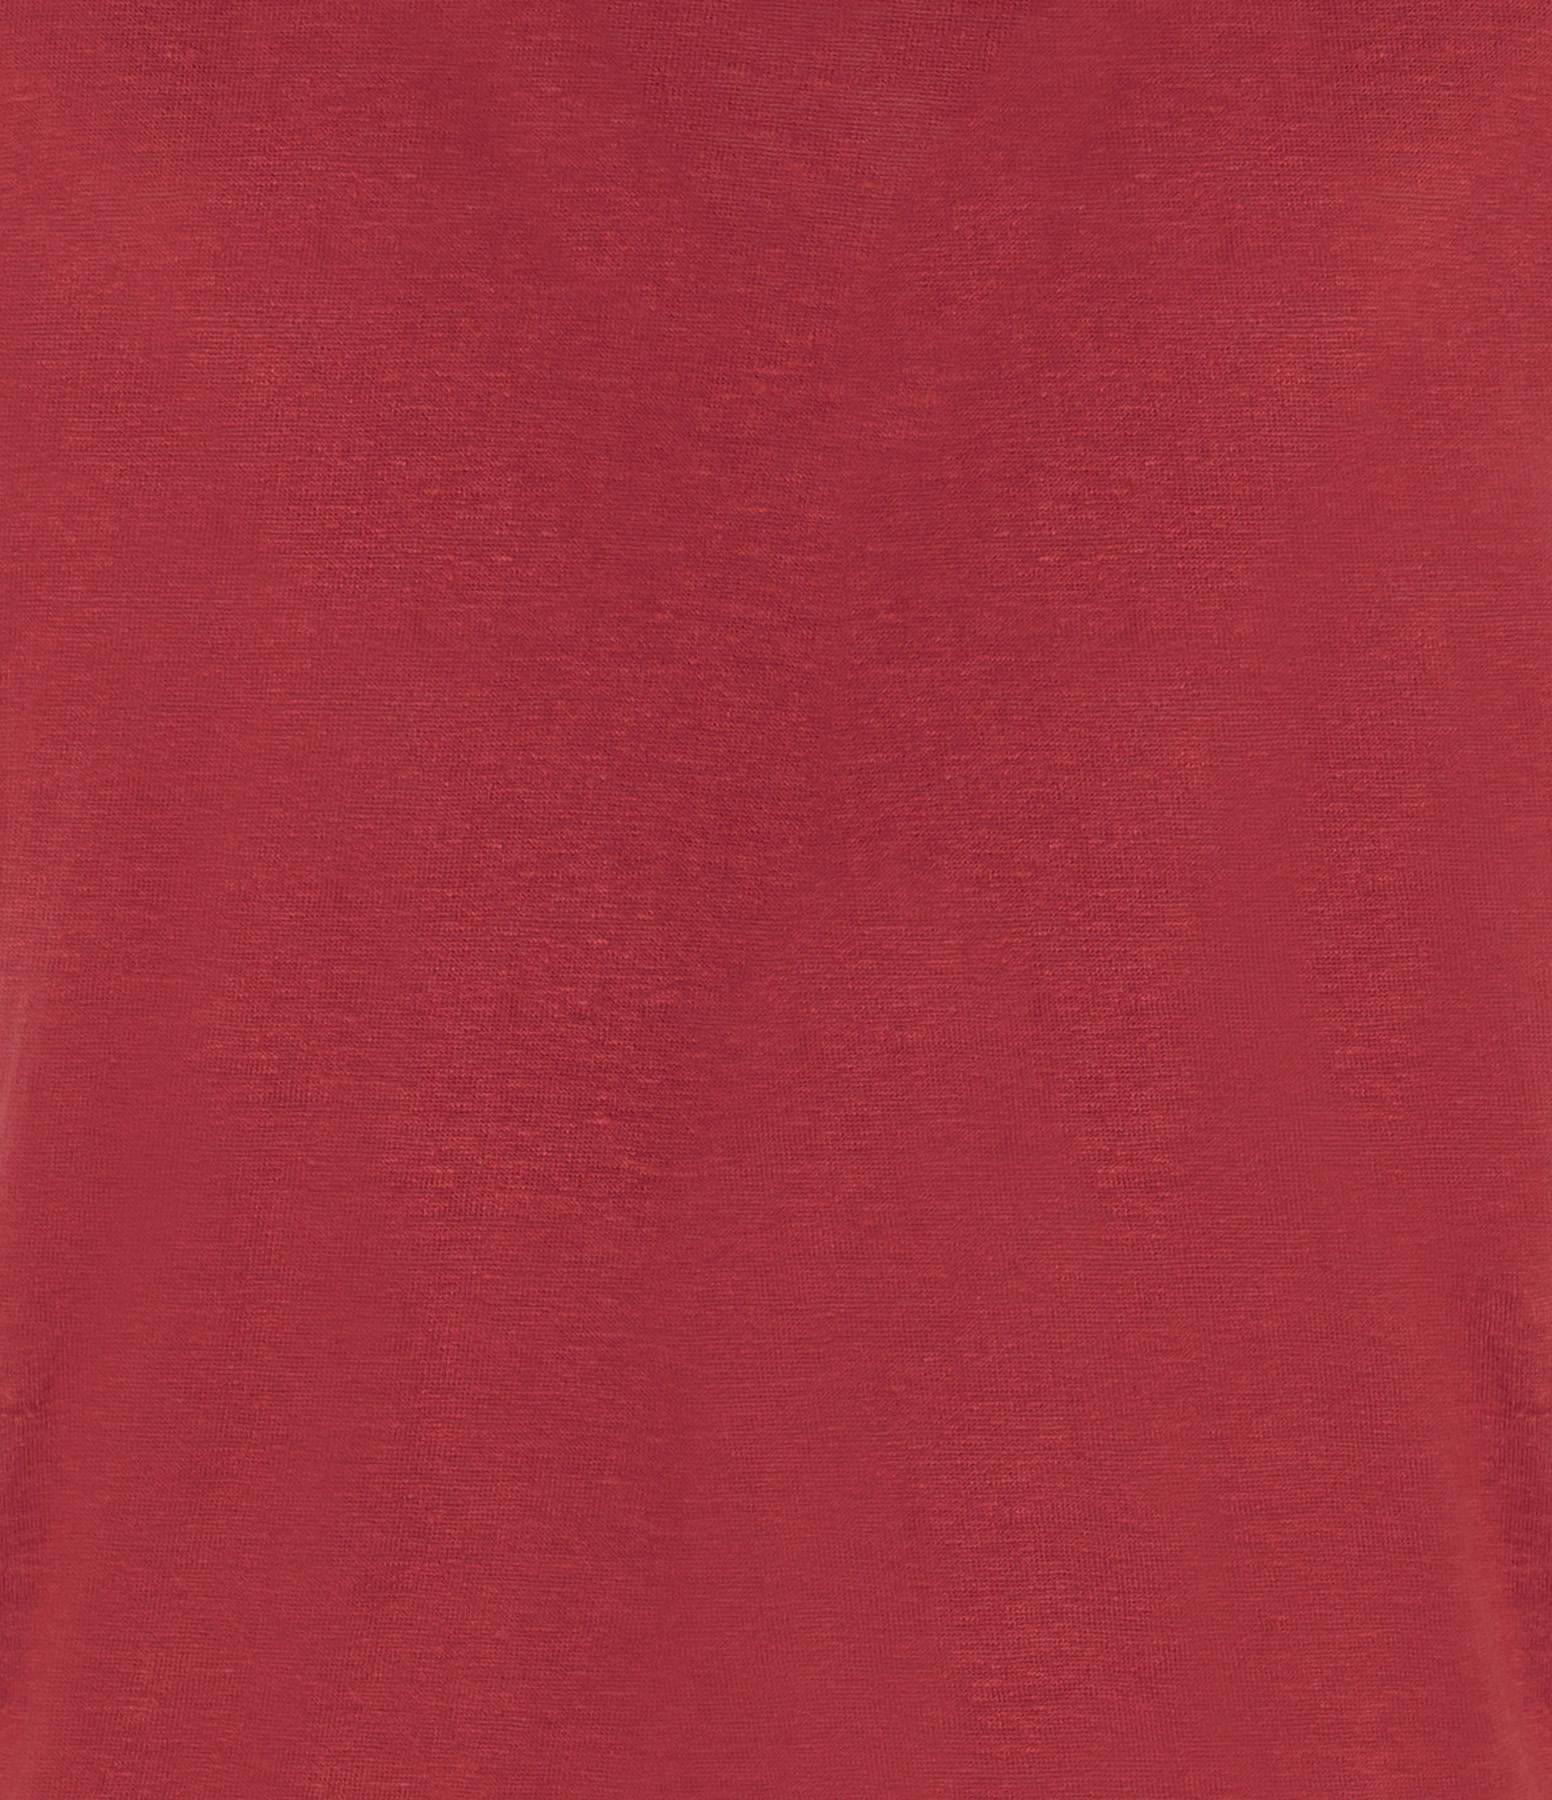 ISABEL MARANT ÉTOILE - Tee-shirt Zankou Lin Rouge